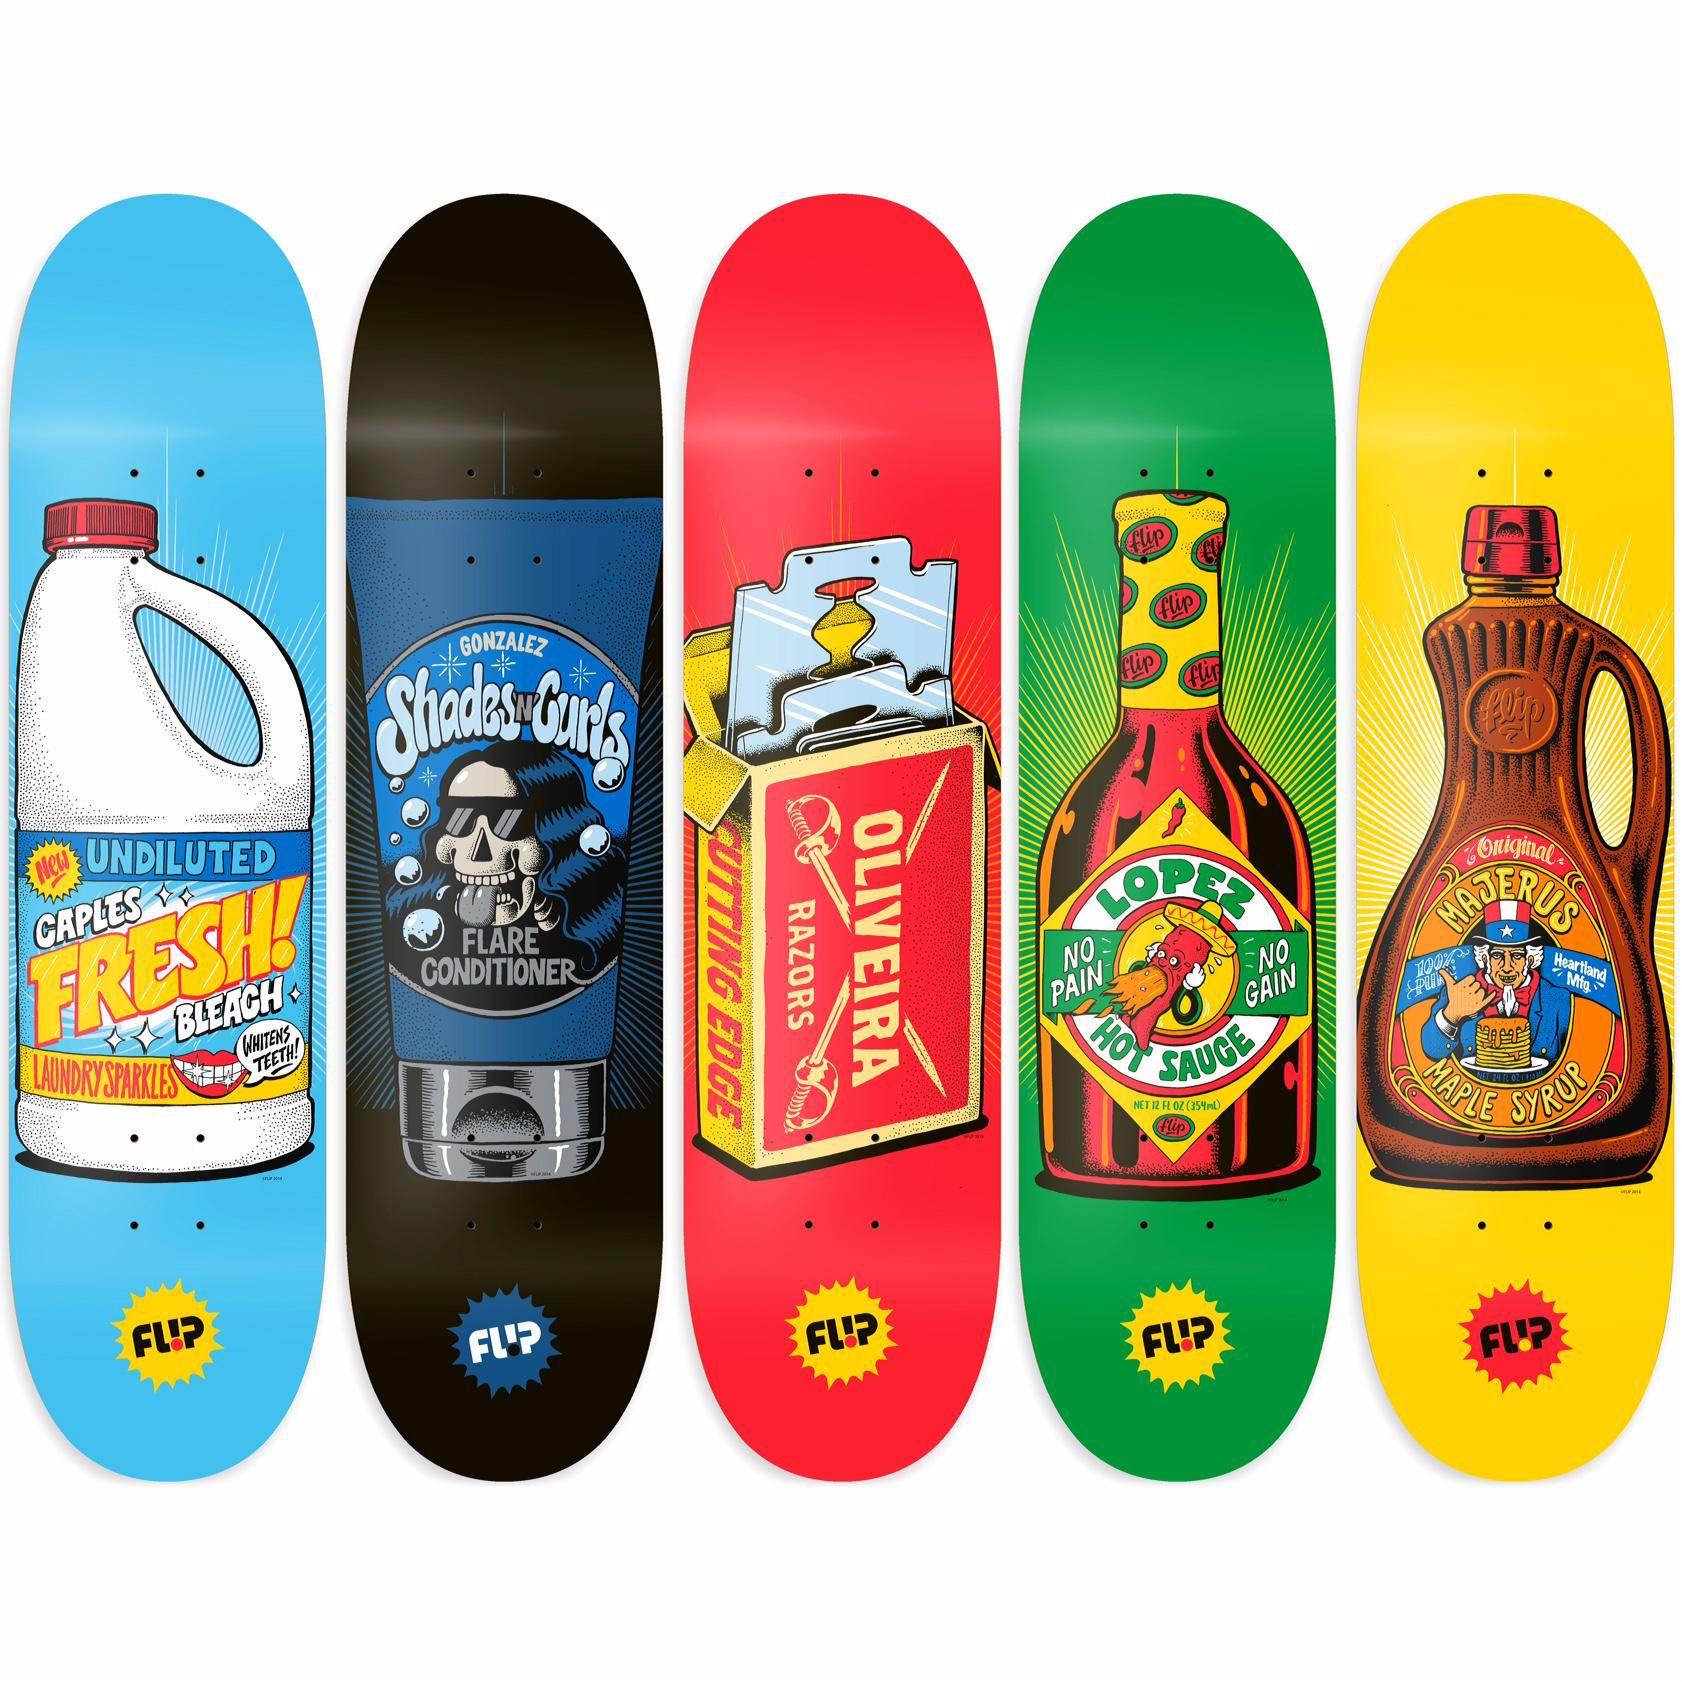 skateboard design b zek0qwwaaf_gwjpglarge 16821682 - Skateboard Design Ideas